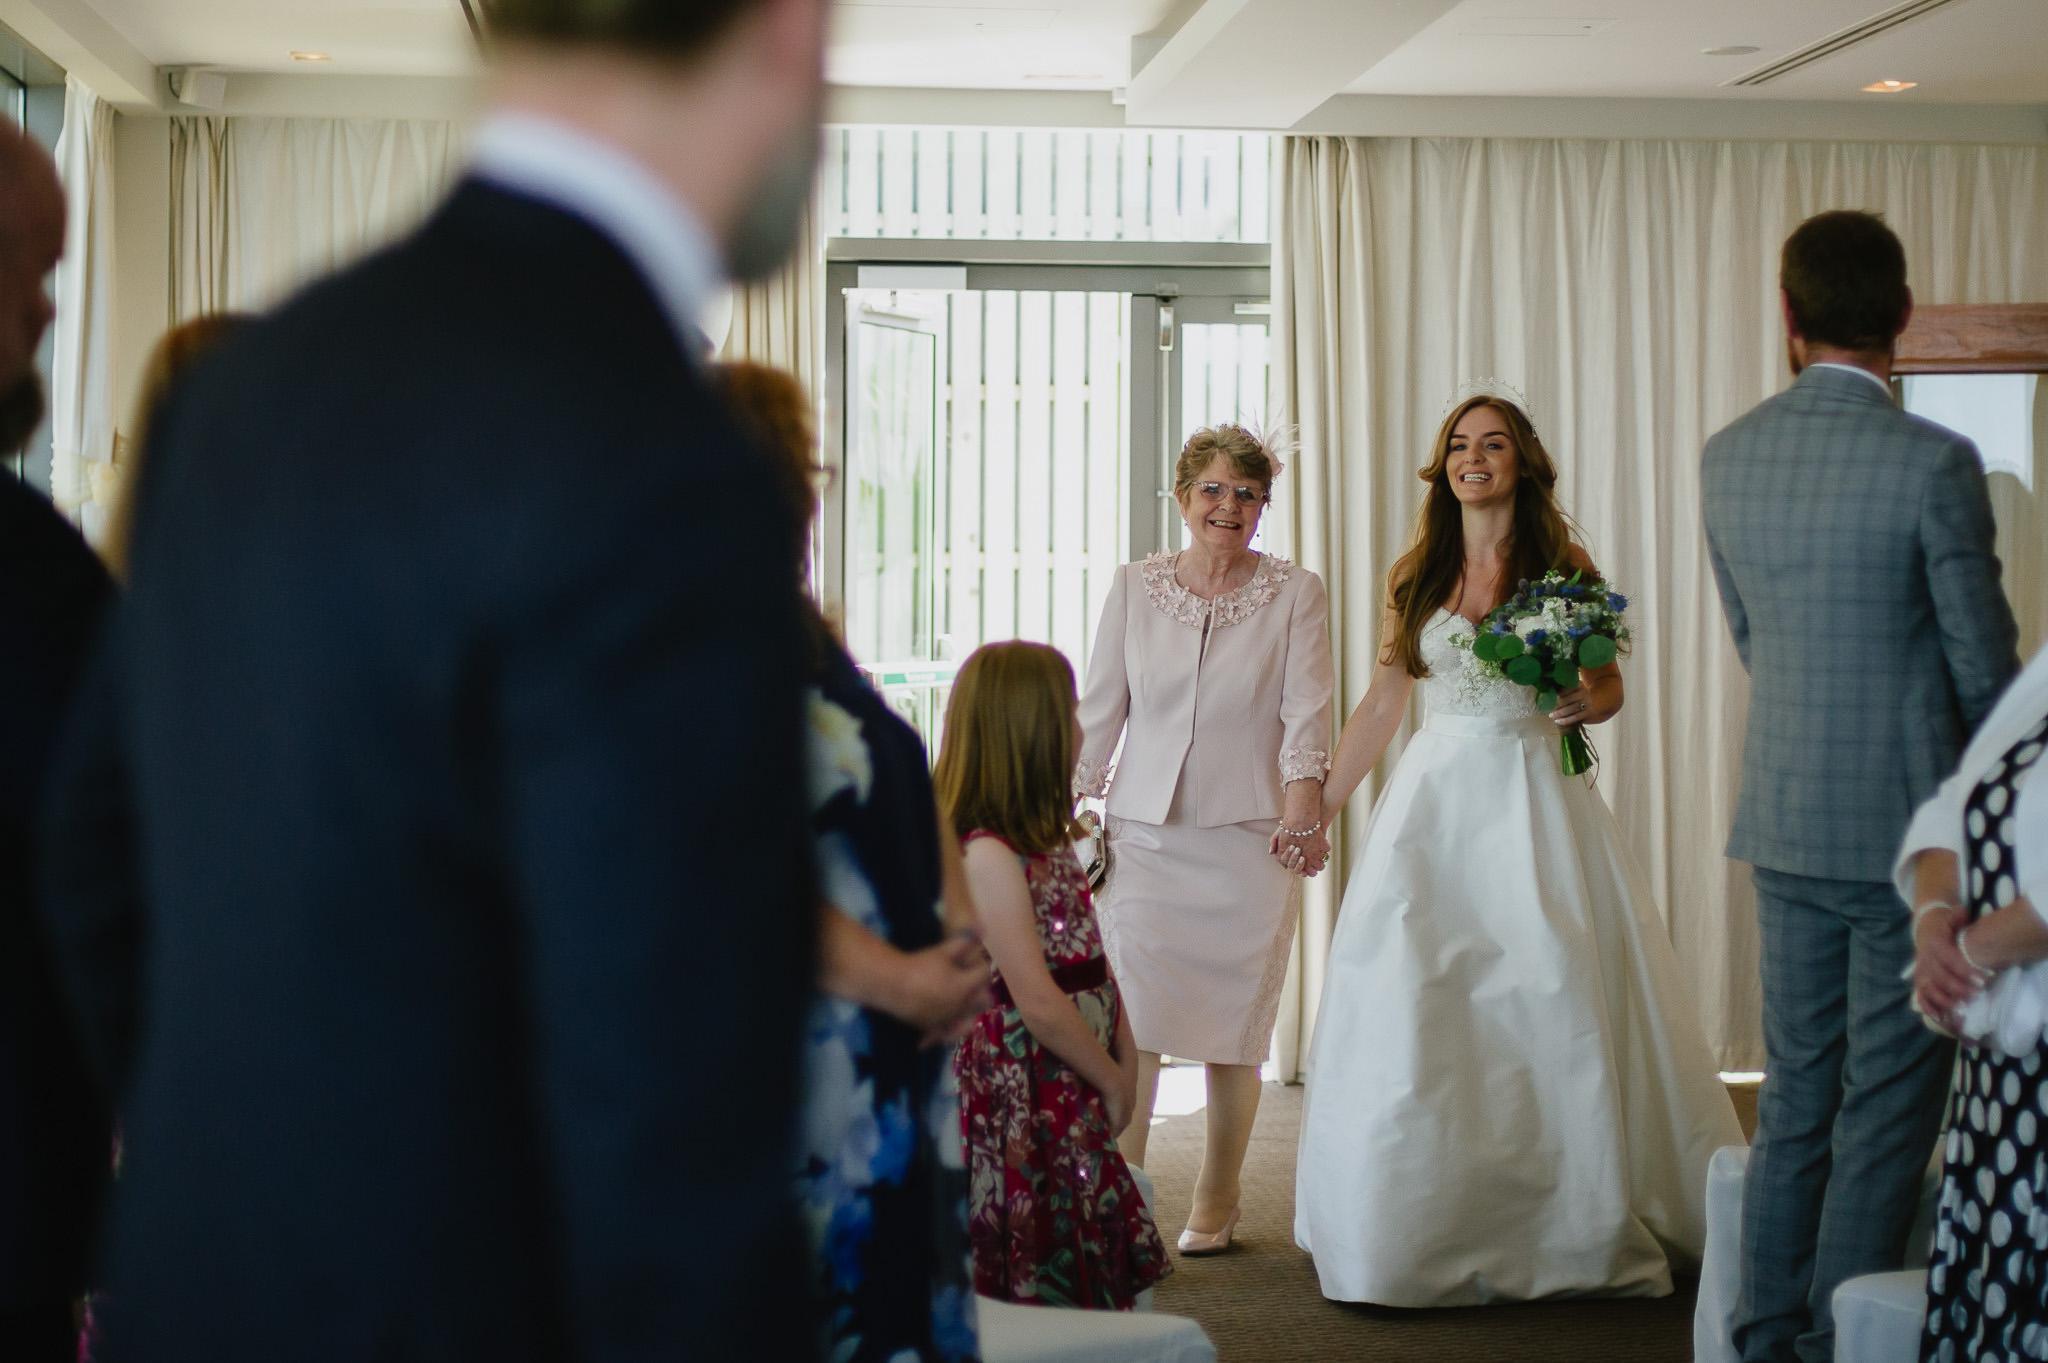 Cliff House Hotel Wedding Photographer Ireland-52.jpg